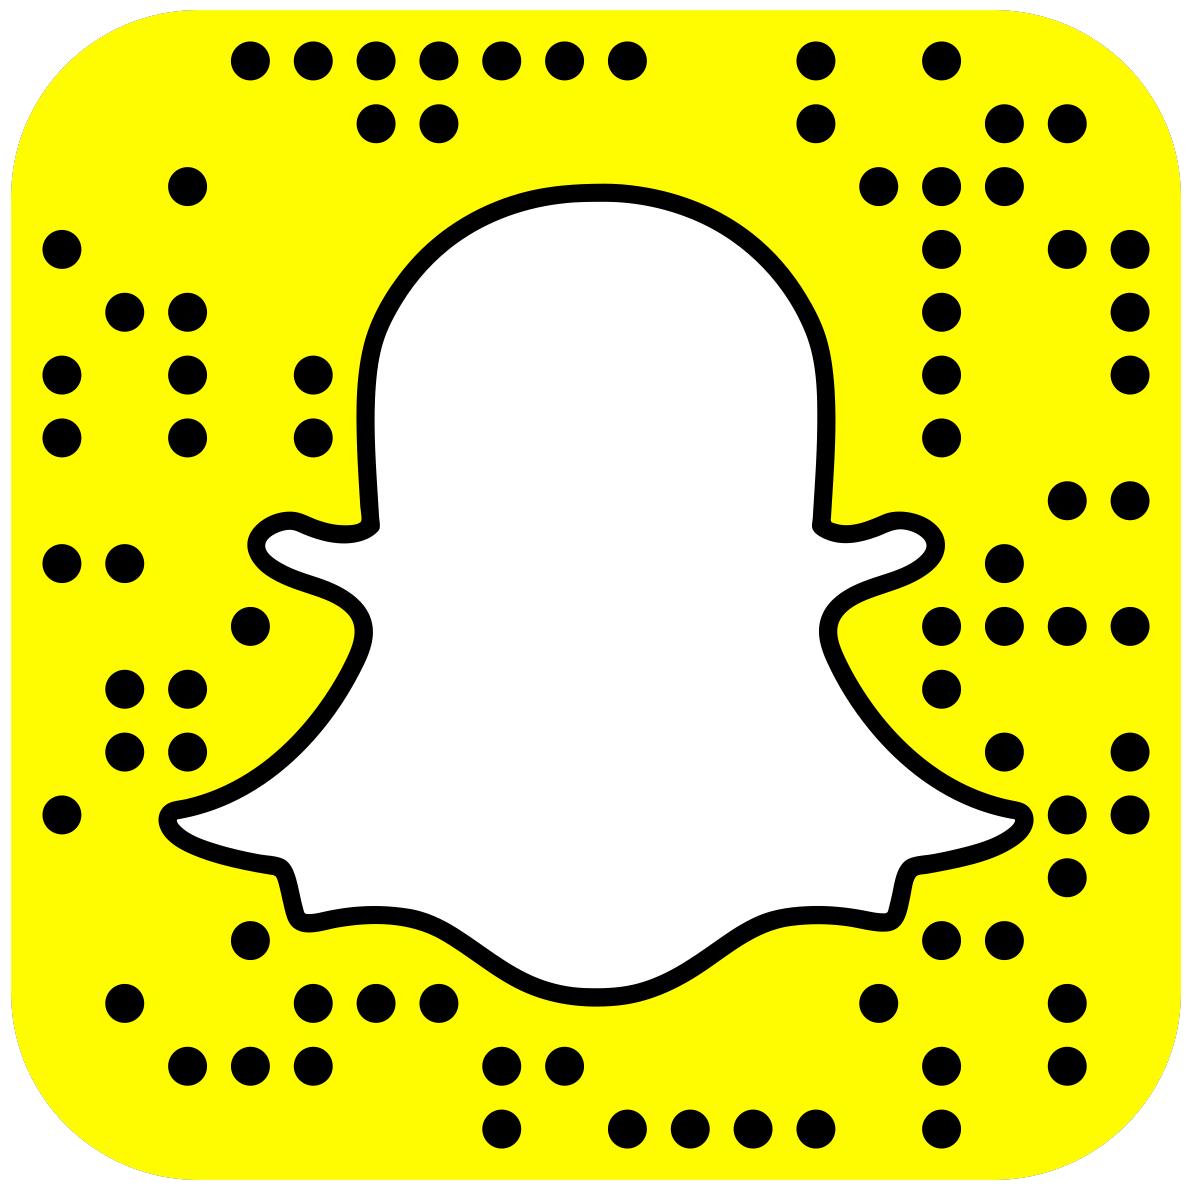 Sanaa Lathan Snapchat username